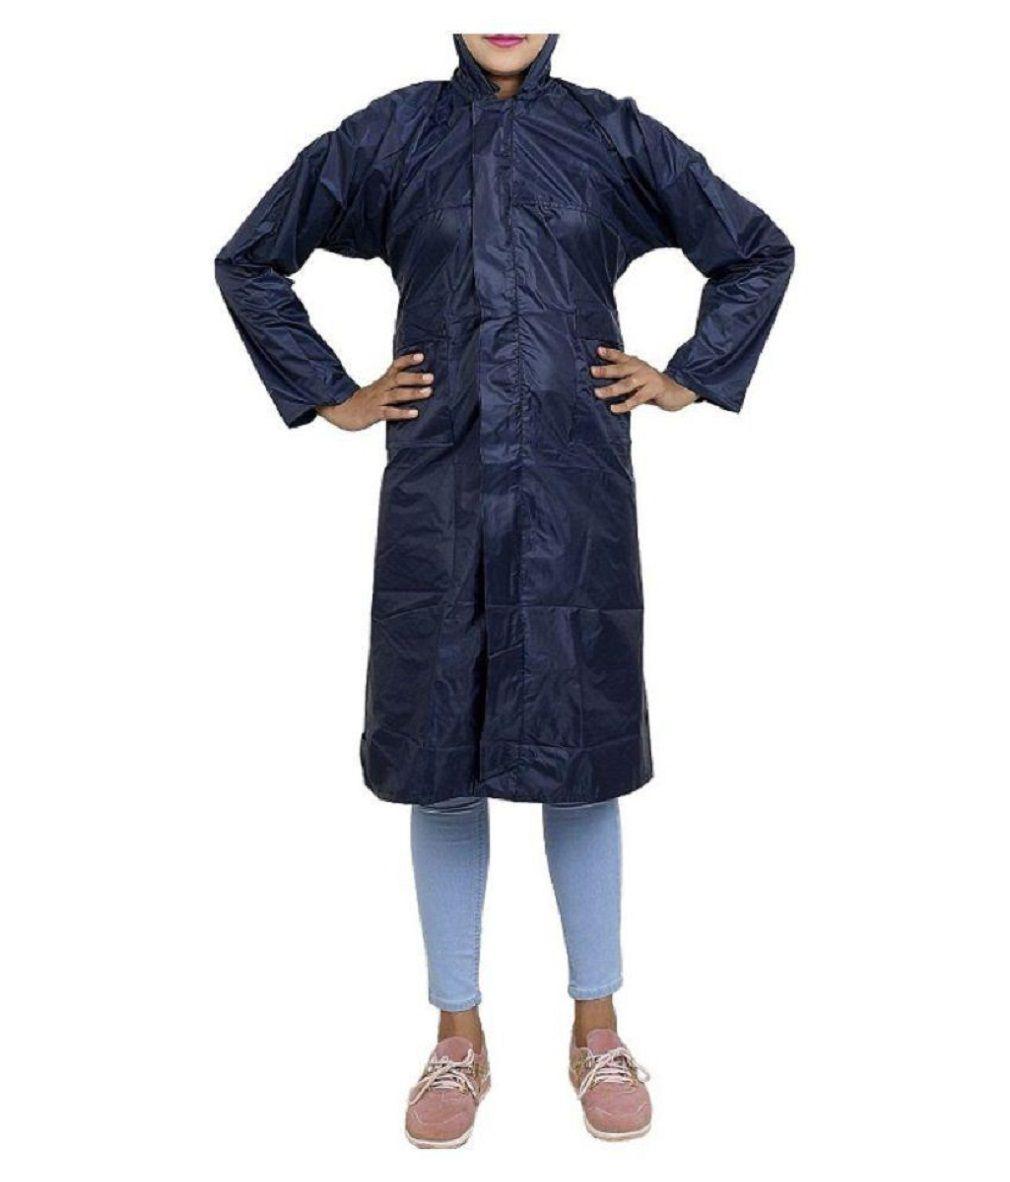 SPZ FASHION Nylon Long Raincoat - Multi Color